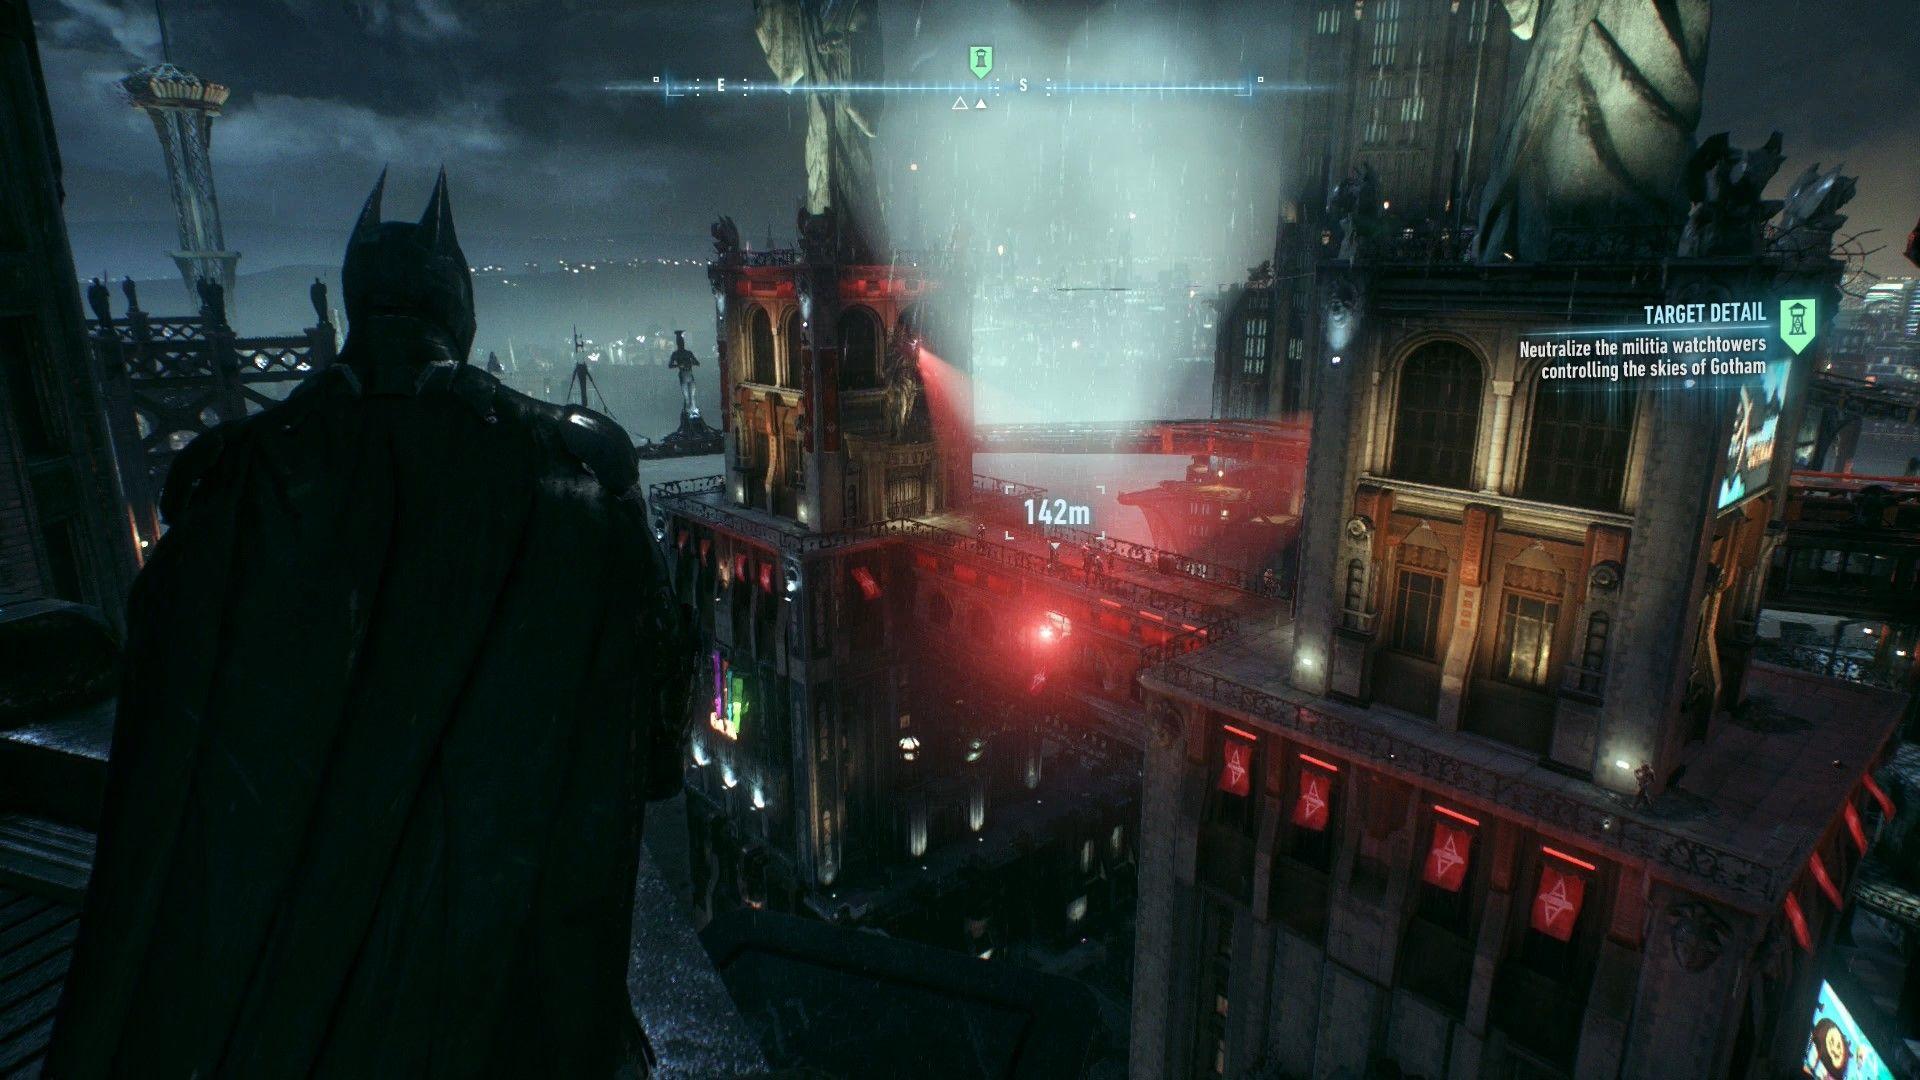 Batman Arkham Knight Occupy Gotham Most Wanted Watchtower